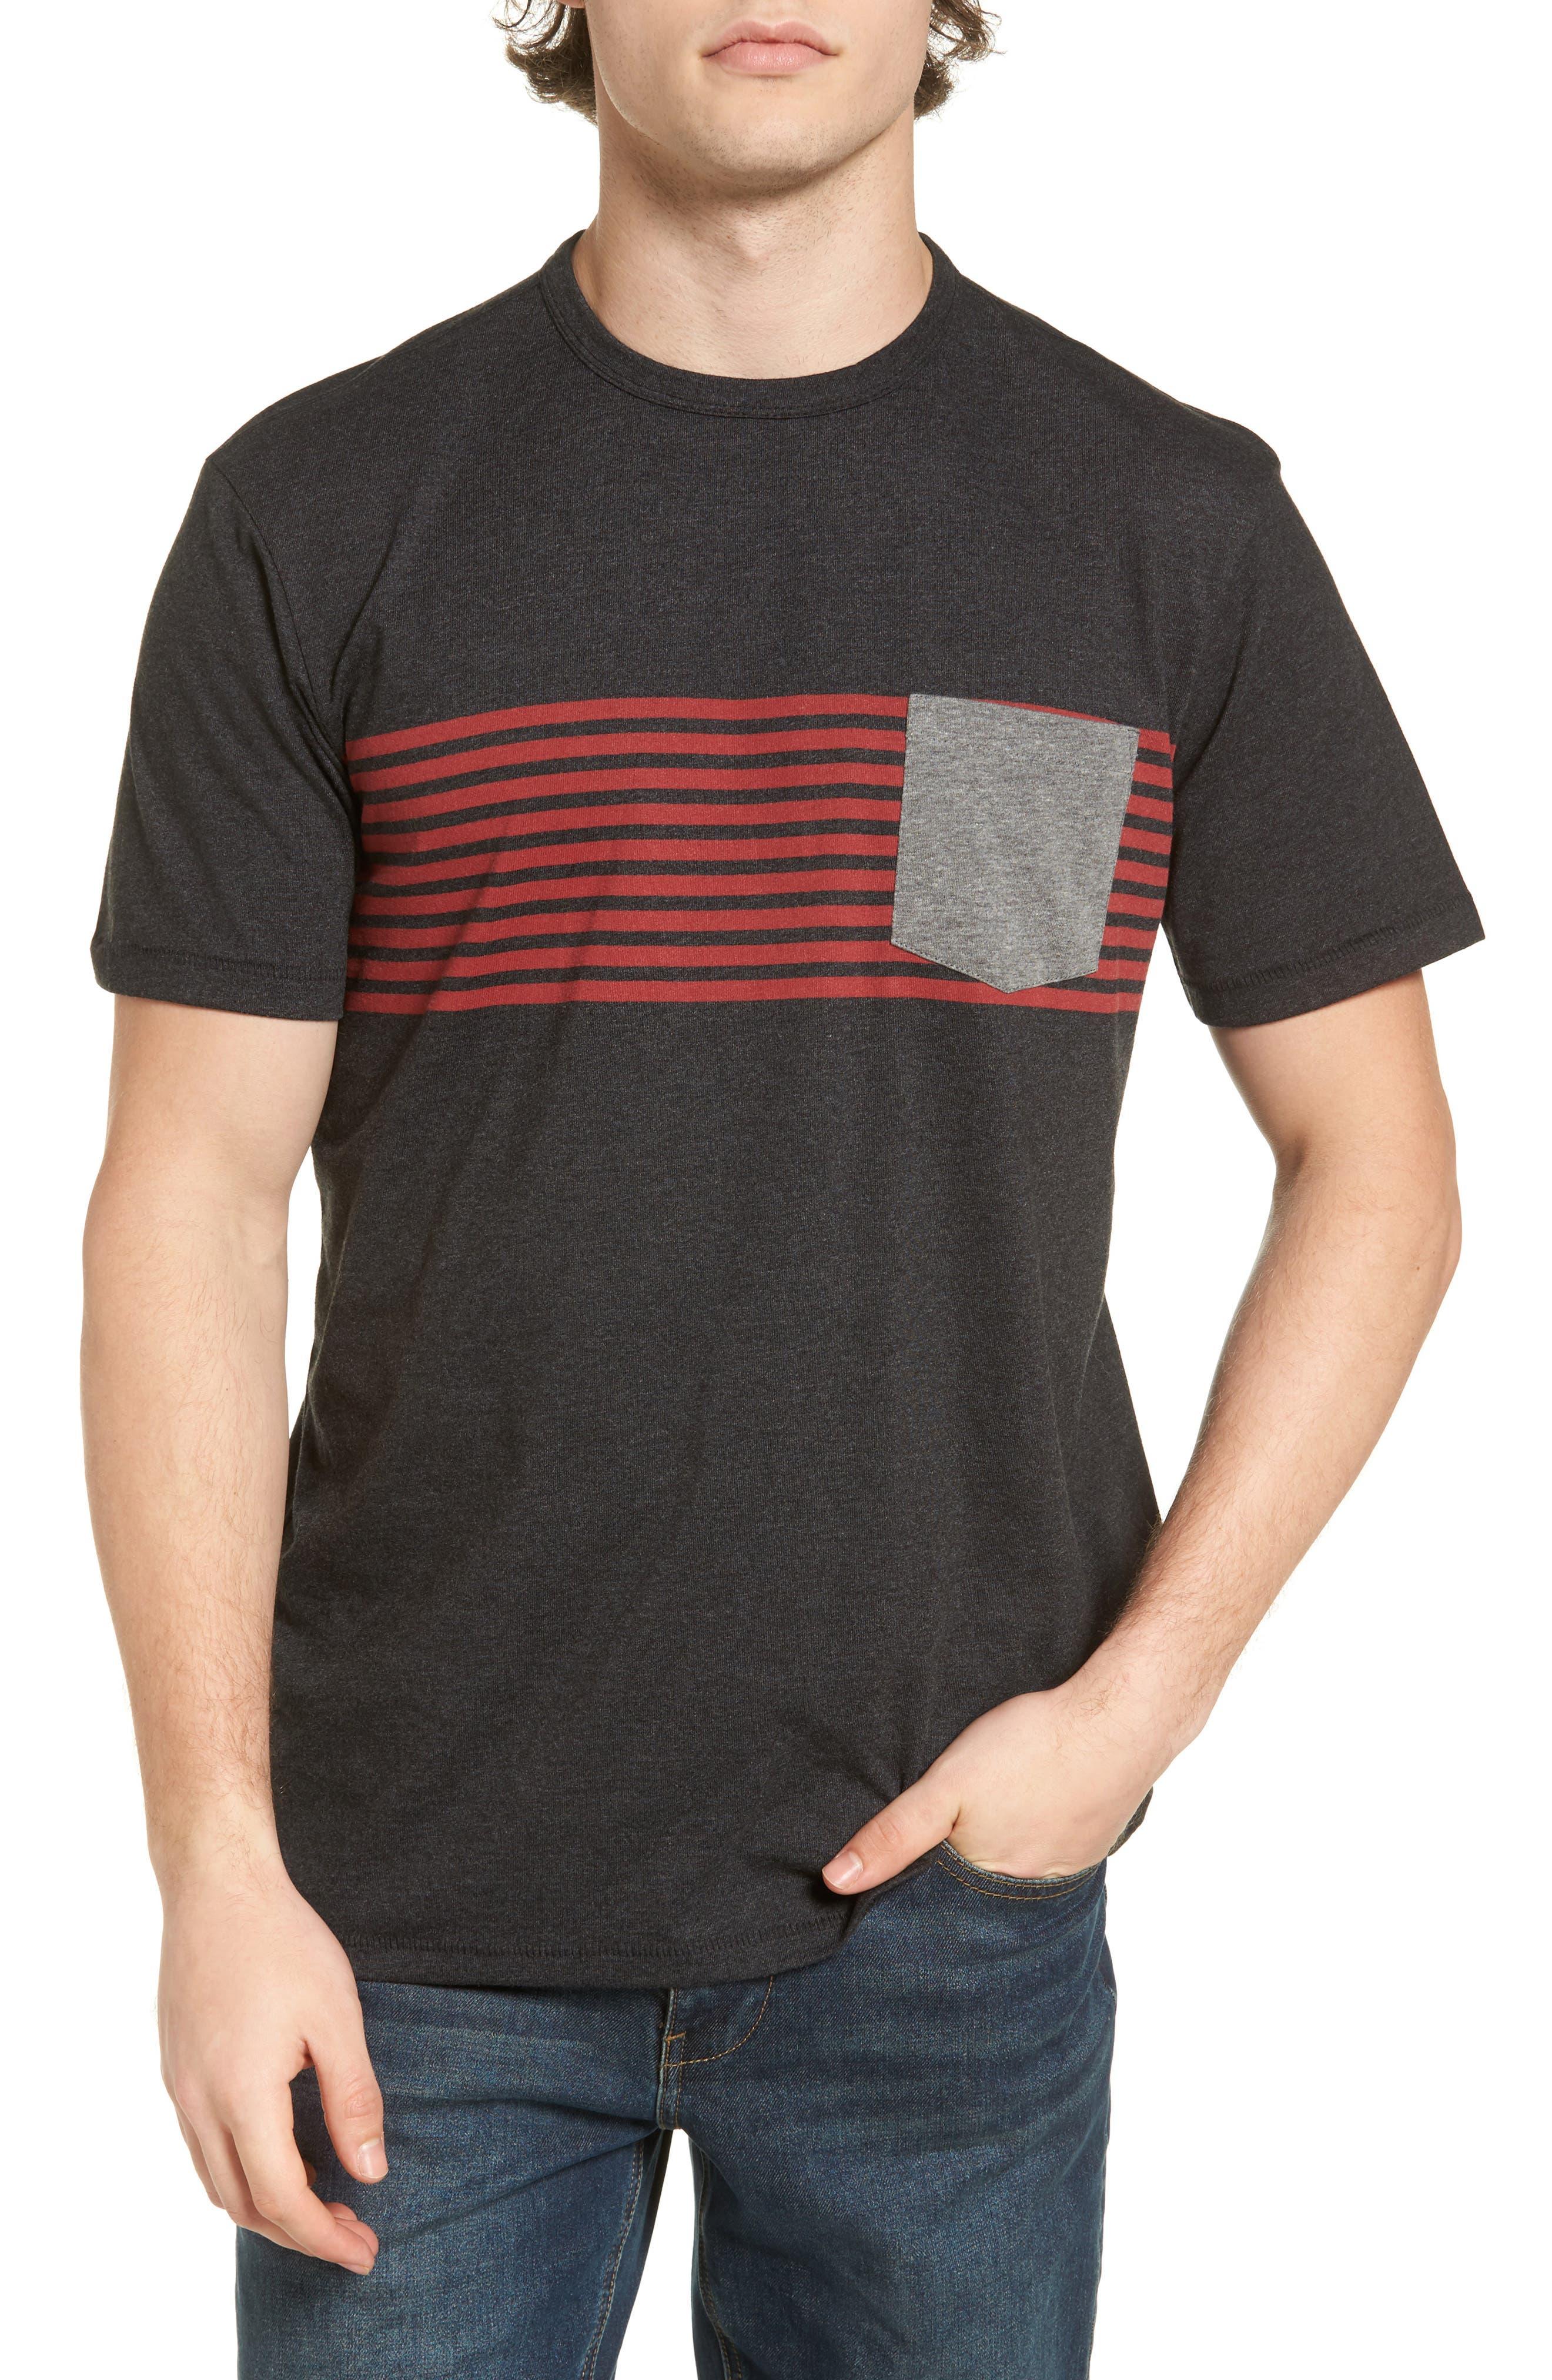 Main Image - O'Neill Rodgers Striped Pocket T-Shirt